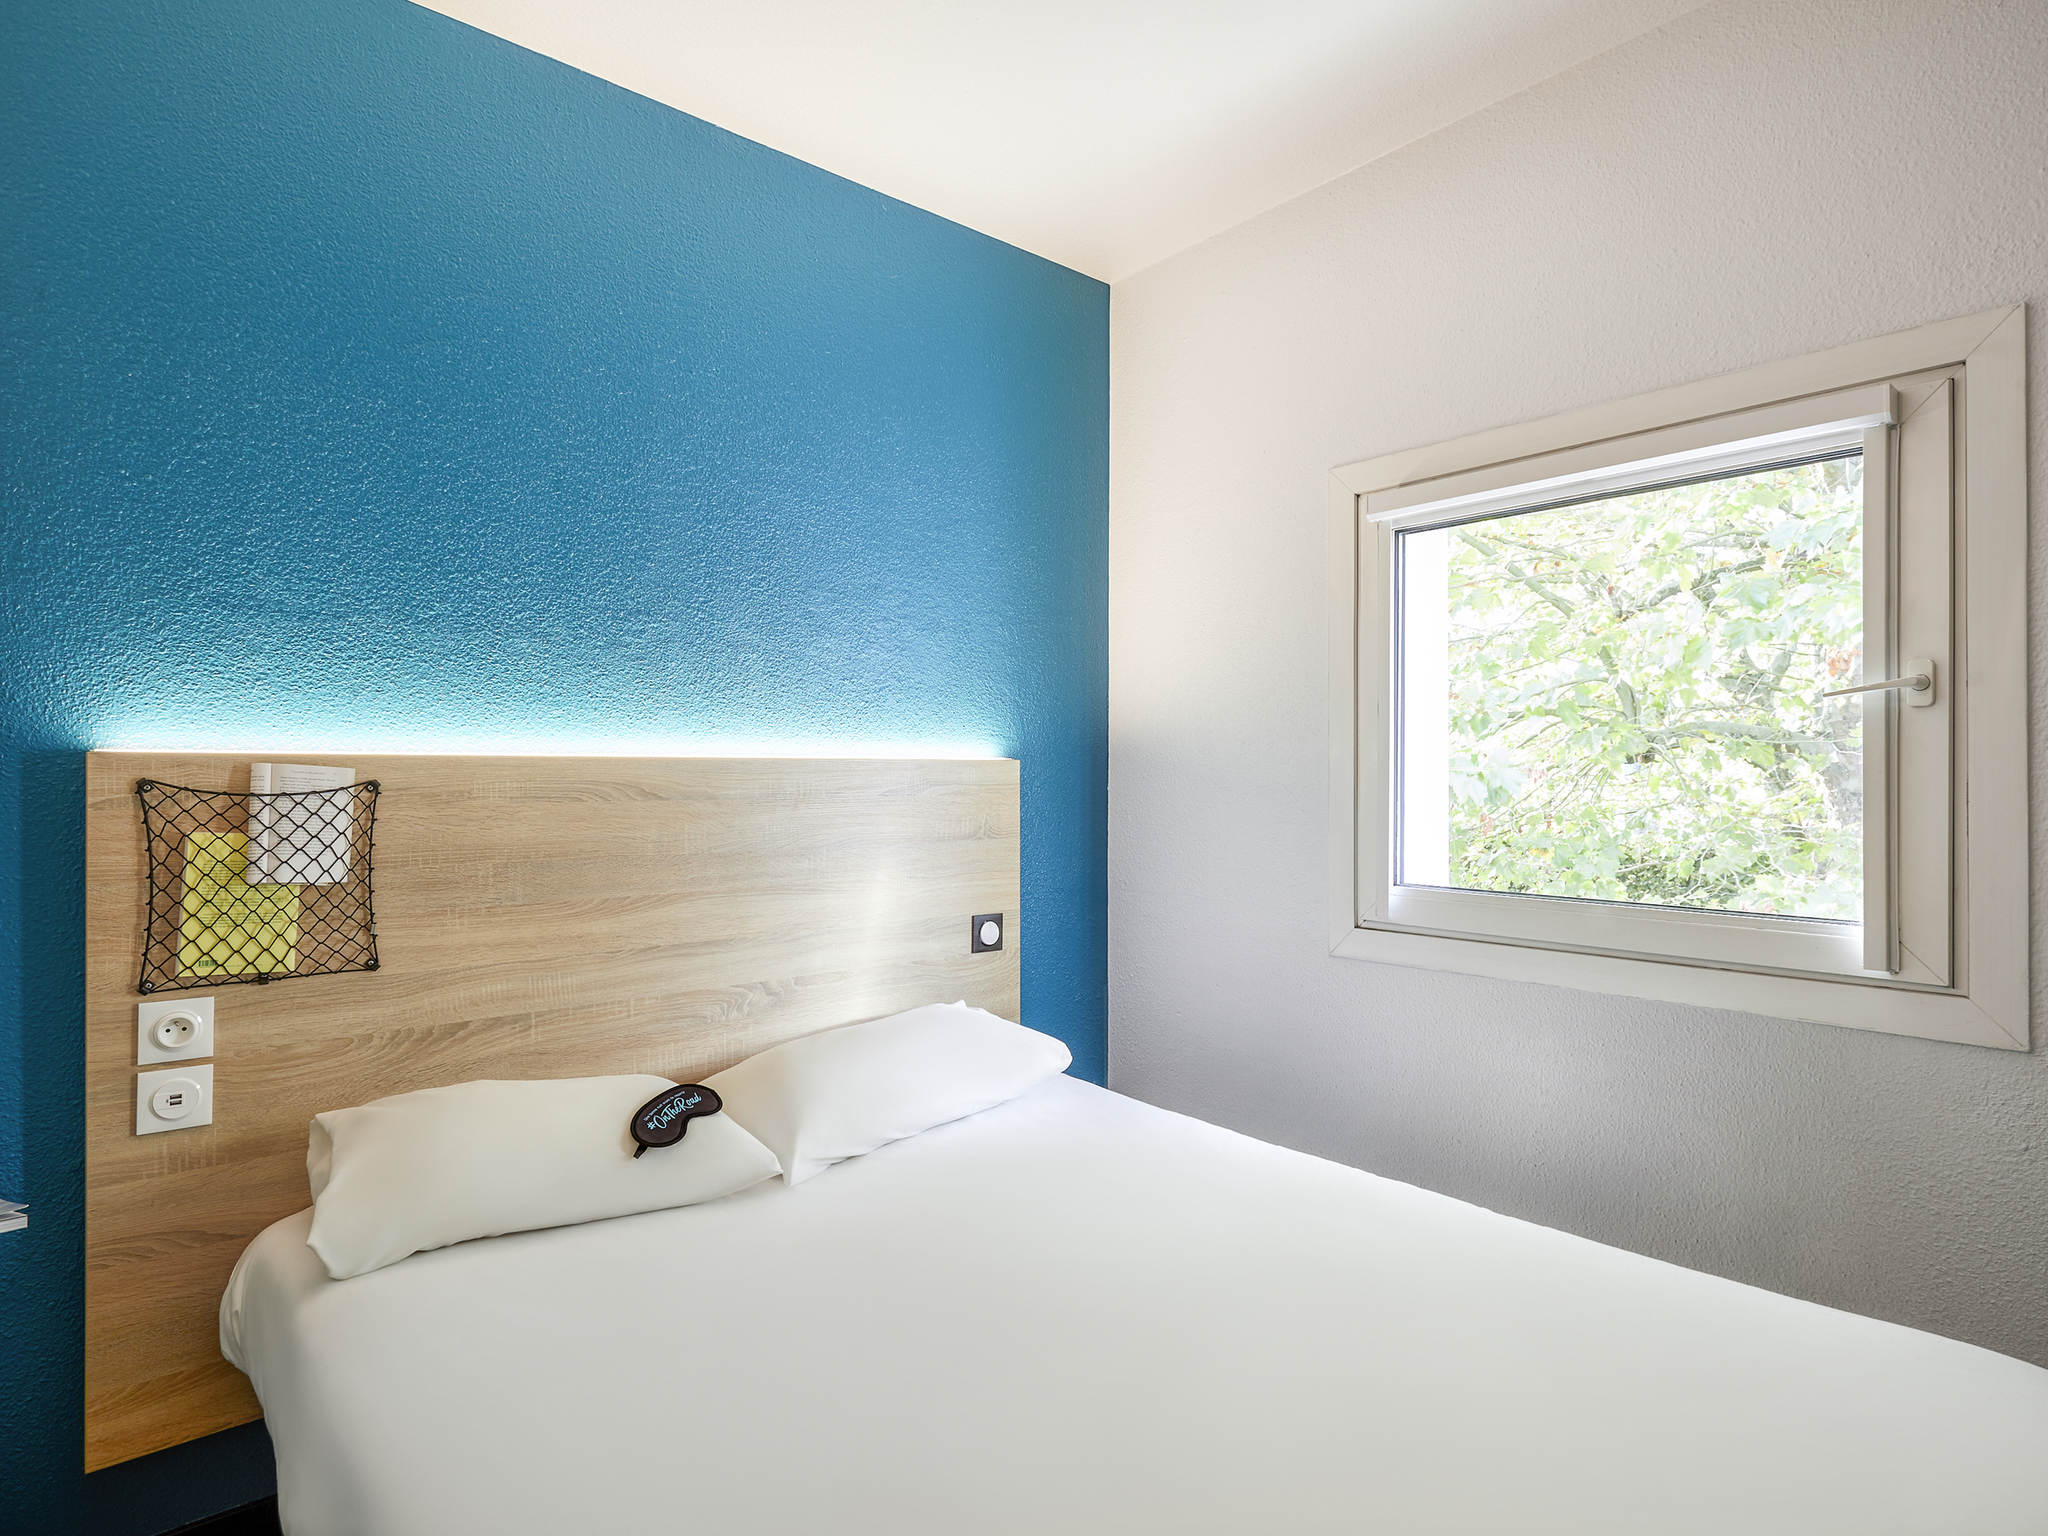 Отель — hotelF1 Lyon Saint-Priest (rénové)